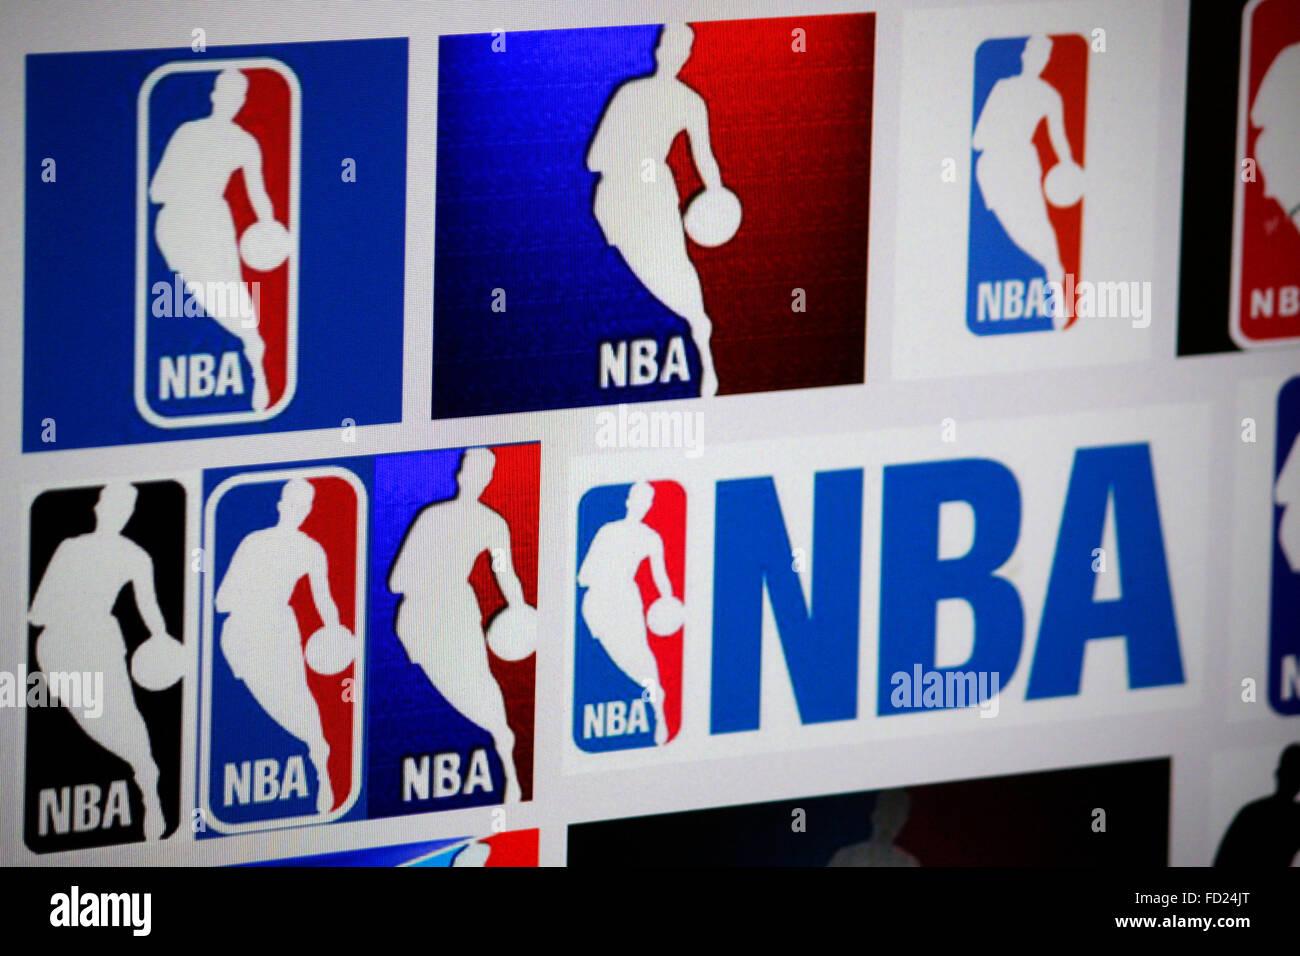 Markenname: 'NBA National Basketball Association' , Berlin. - Stock Image